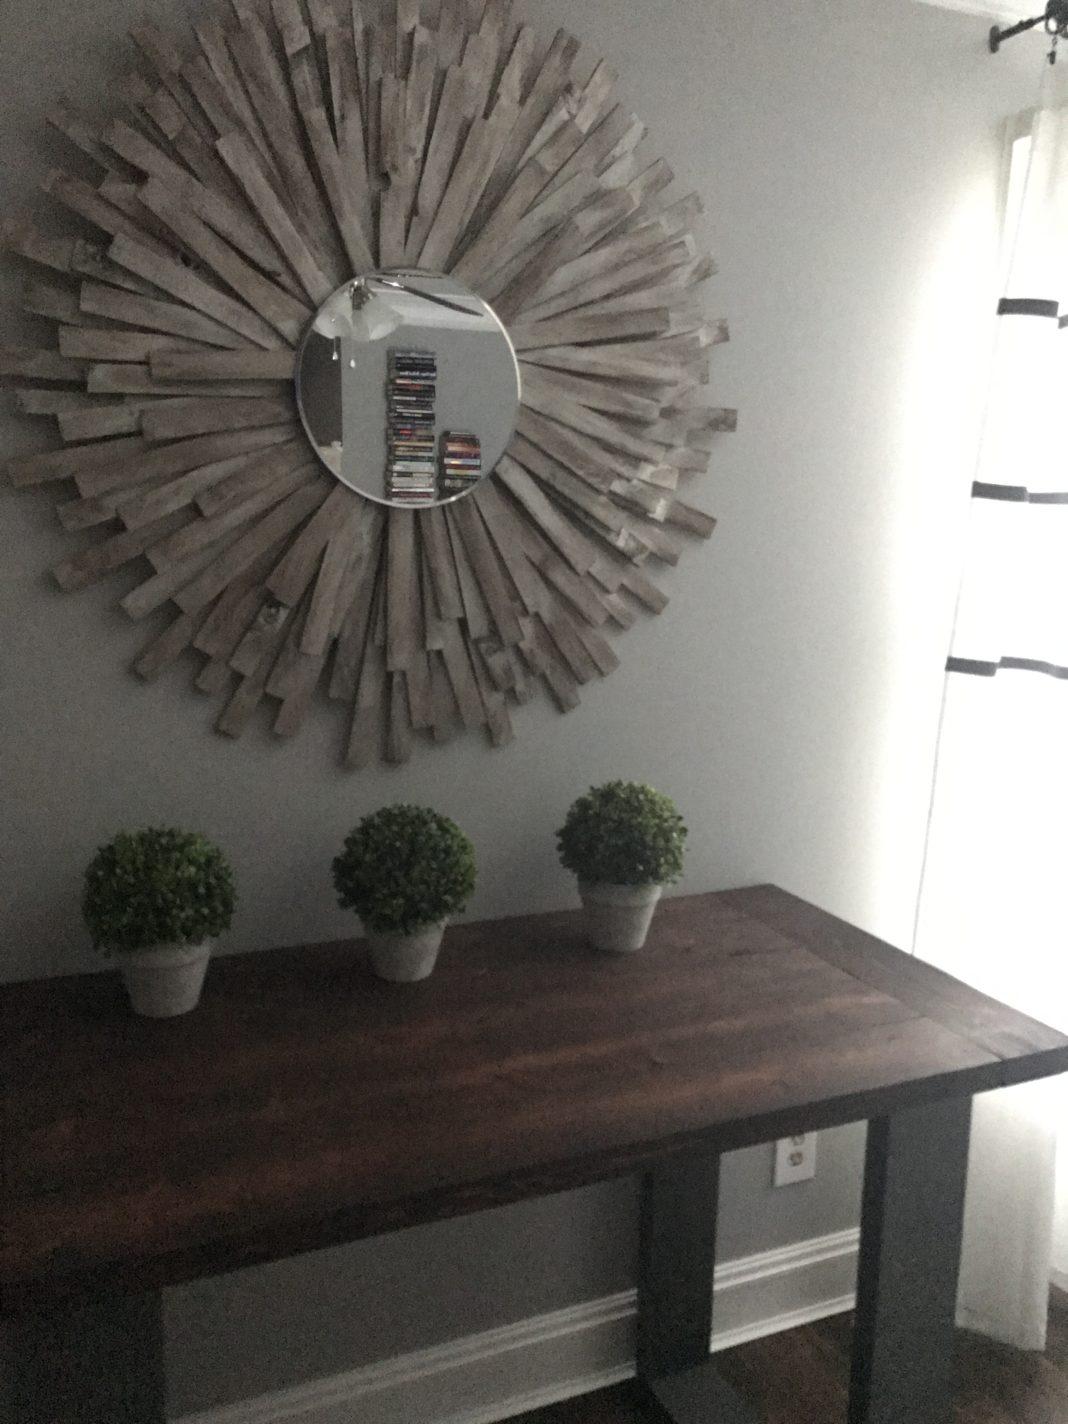 Sunburst Mirror DIY- Cheap and Creative Wall Art with Wood ... on Creative Wall Decor  id=21088